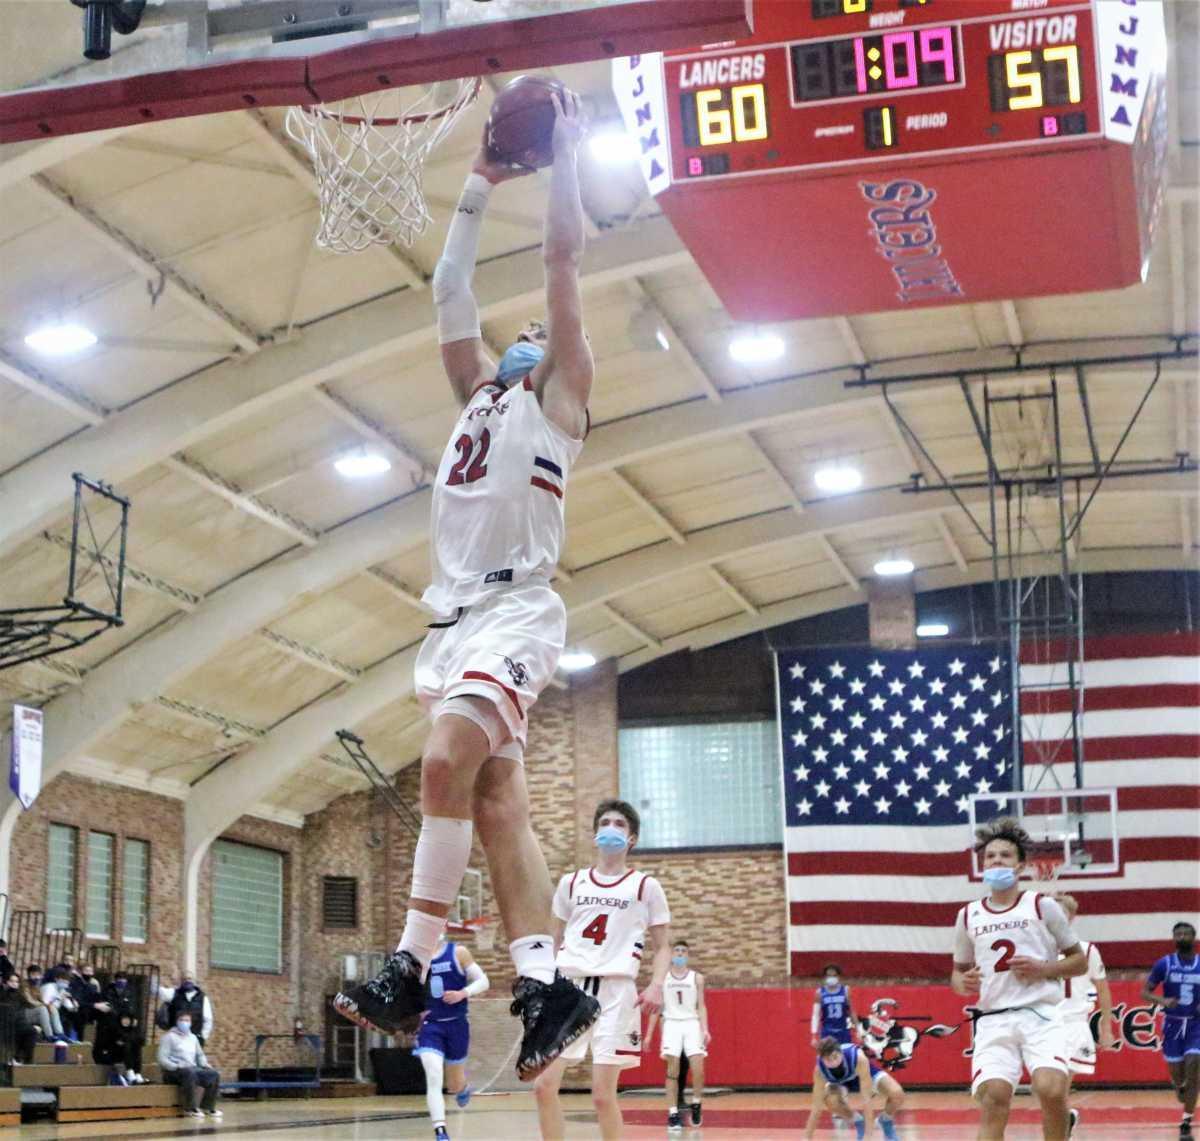 St. John's Northwestern Academies guard Brandin Podziemski throws down a dunk to seal a win over Oak Creek.